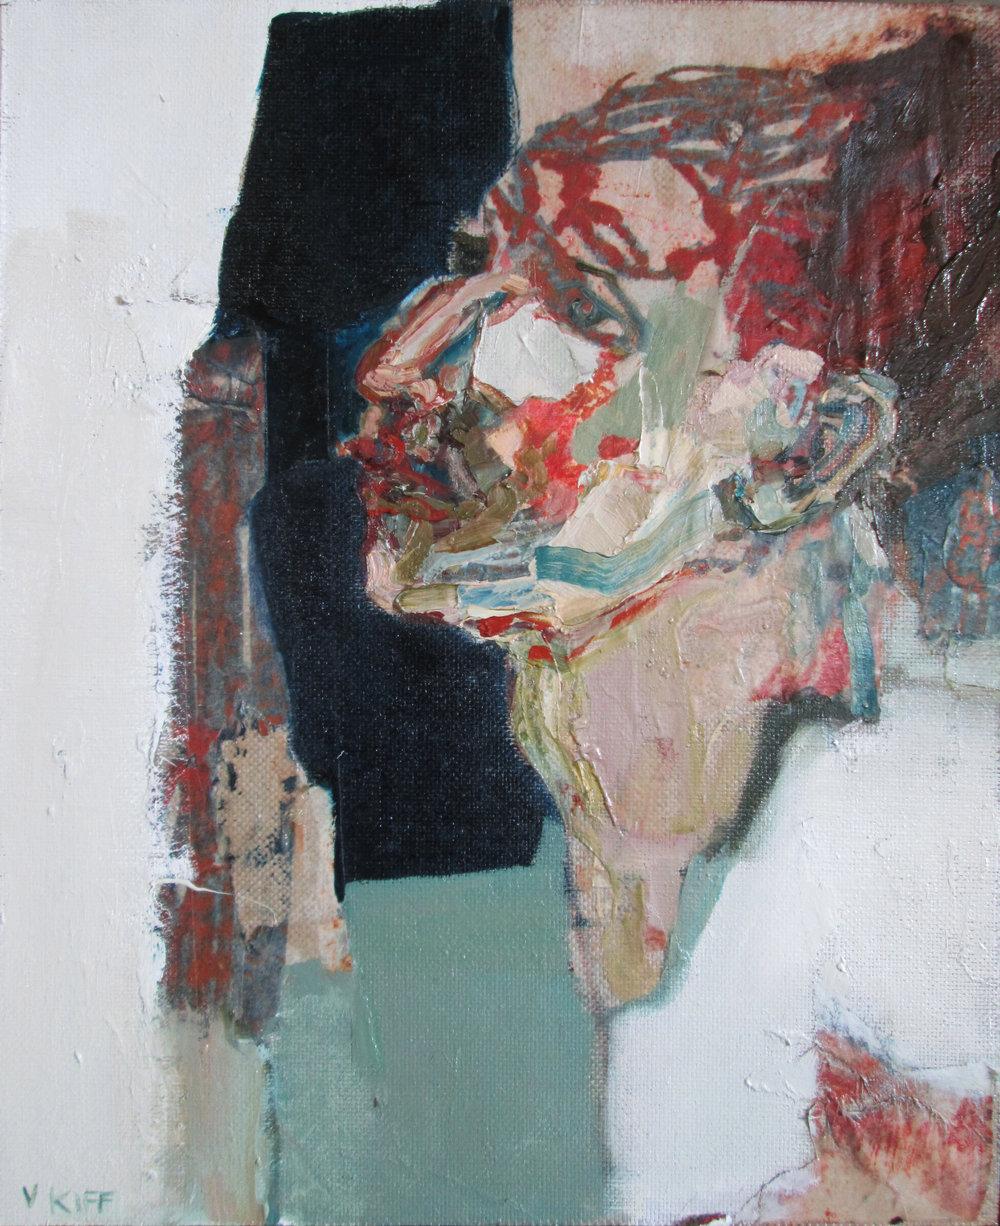 Title: Carmine Lake  Size: 51 x 58 cm  Medium: Oil on linen panel  Price:  SOLD